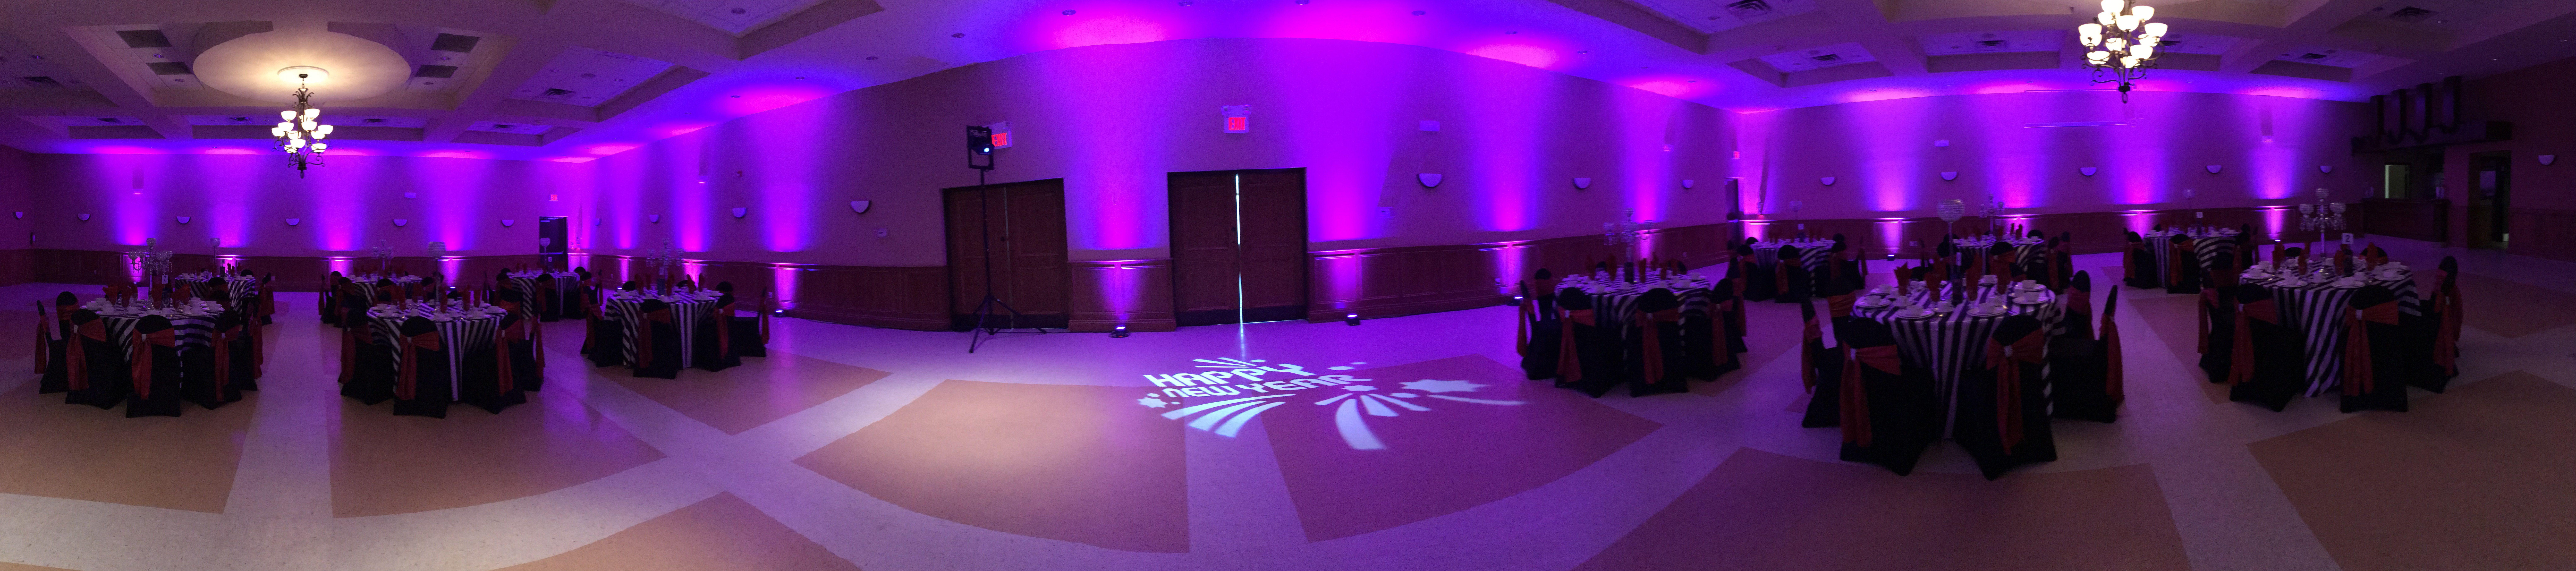 Lights Sound Action Entertainment Services provides